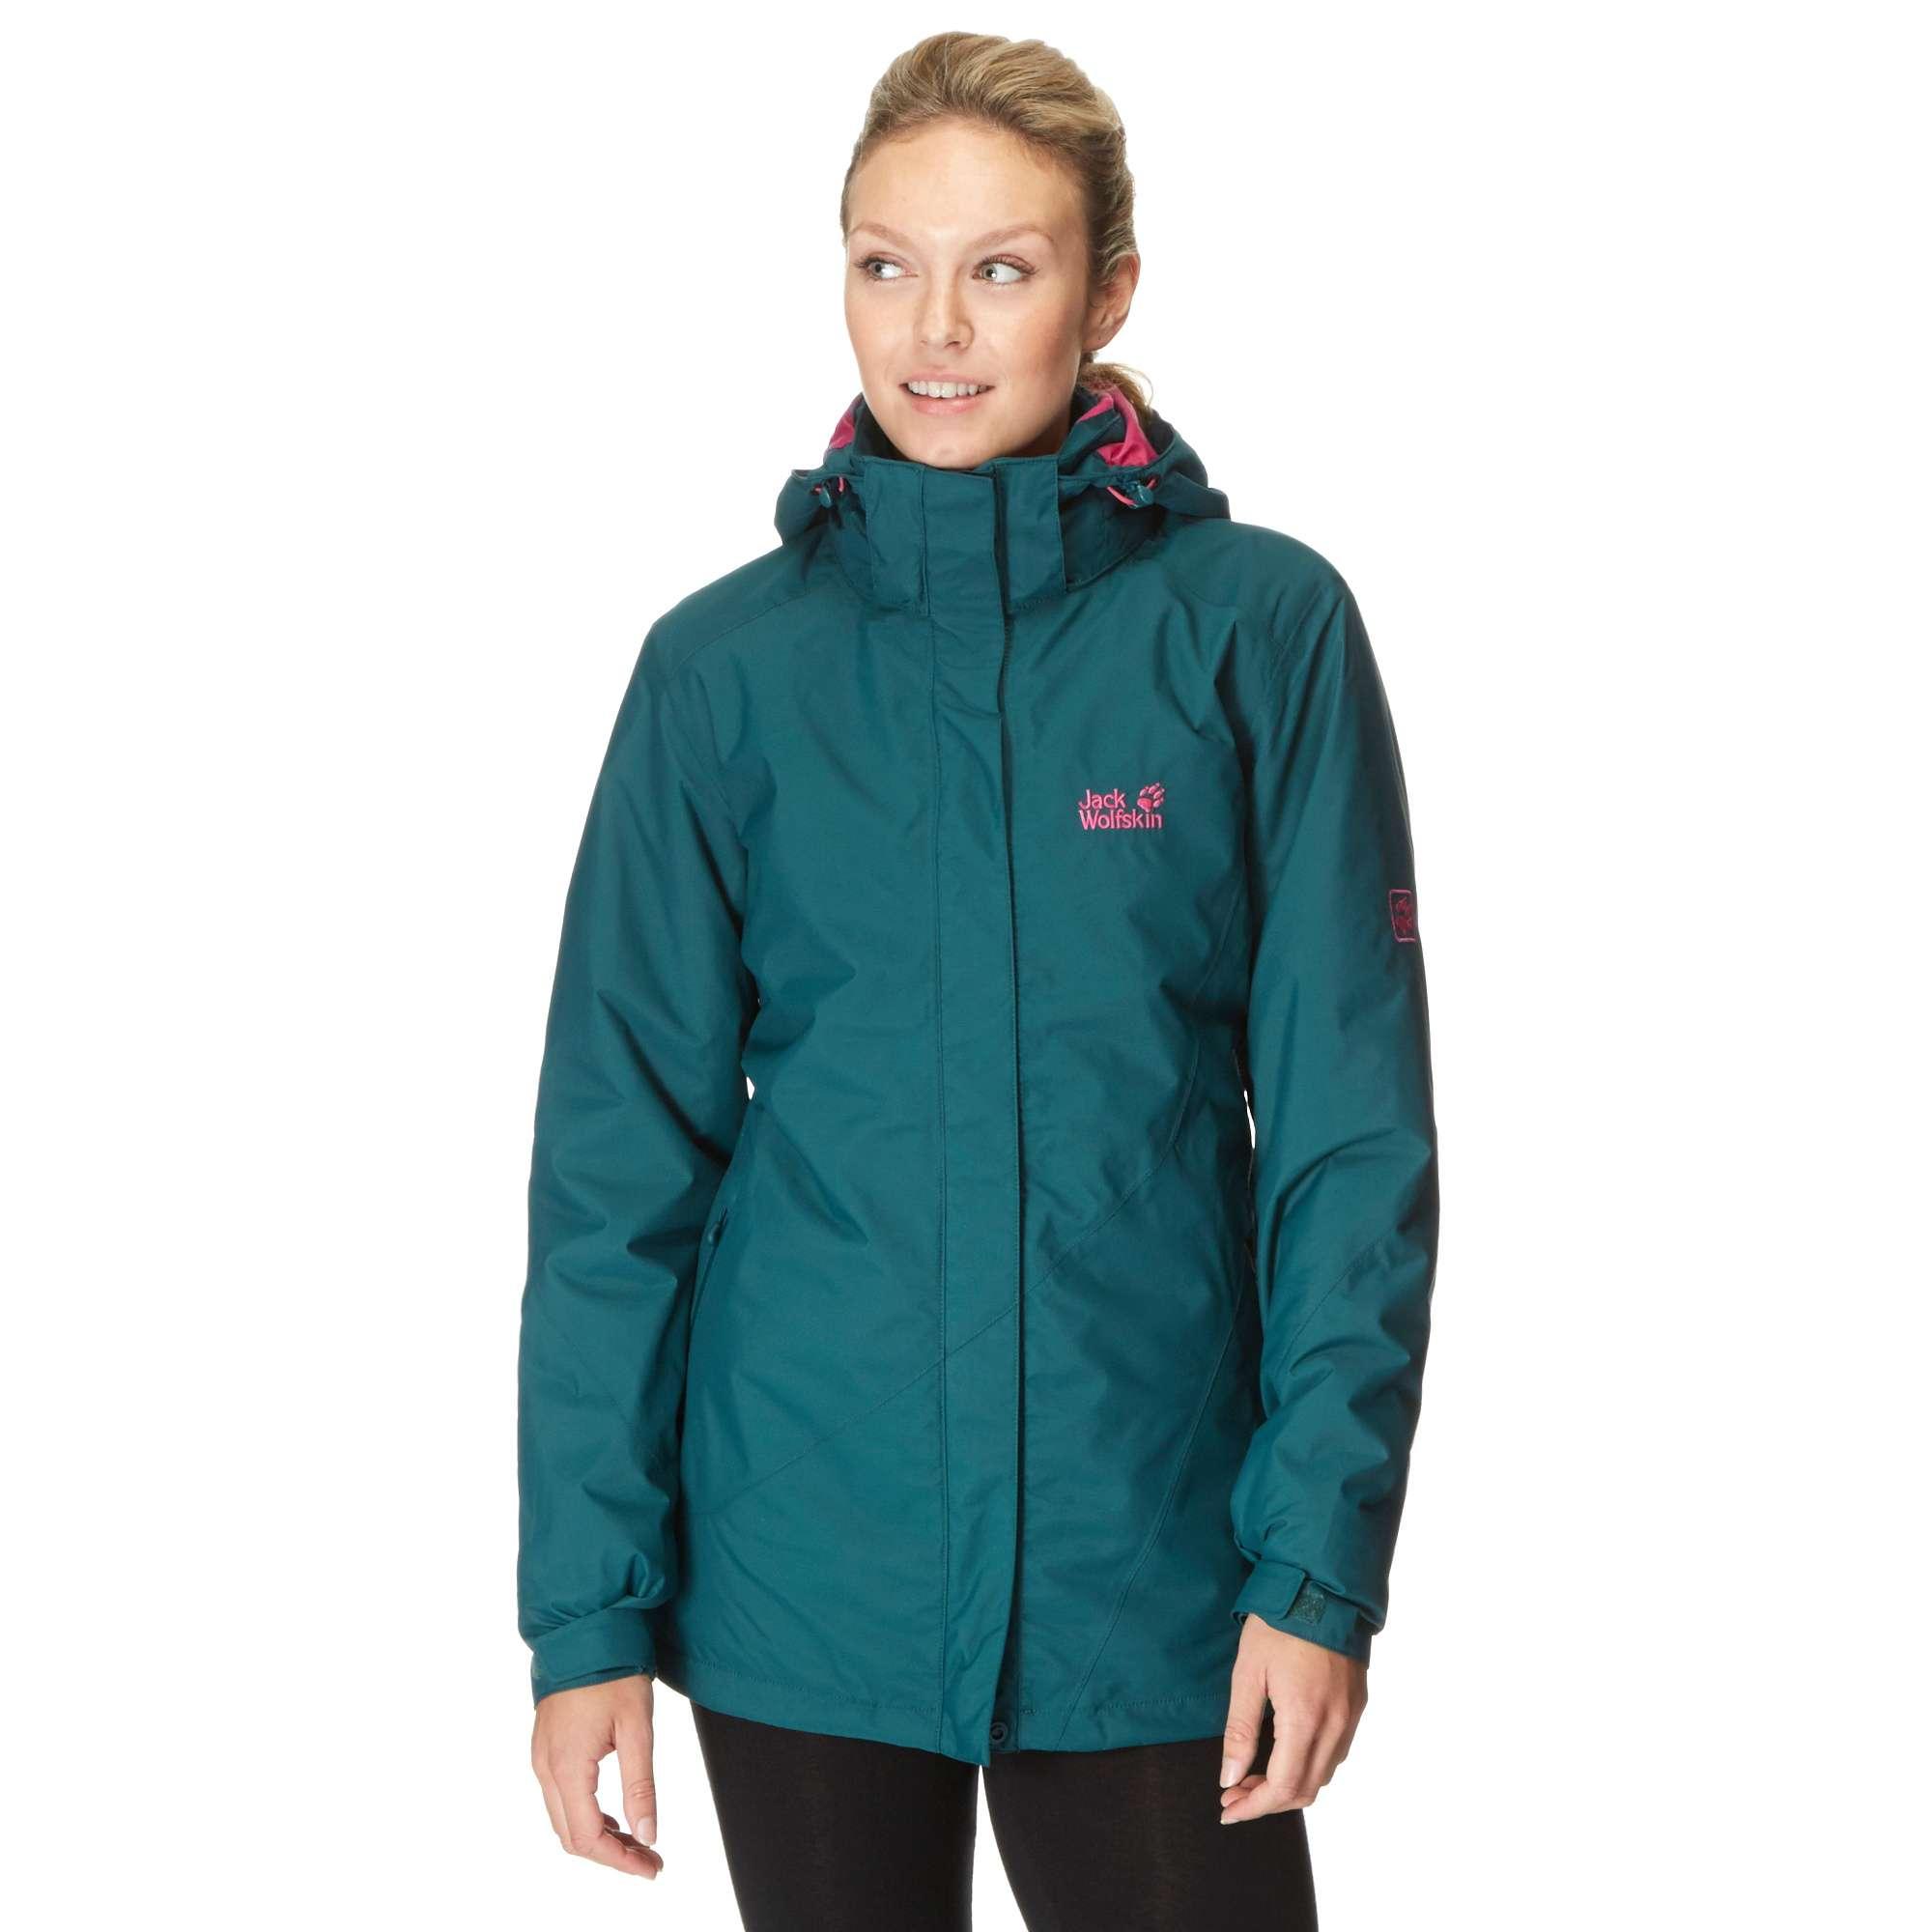 JACK WOLFSKIN Women's Arbourg 3 in 1 Texapore Hiking Jacket